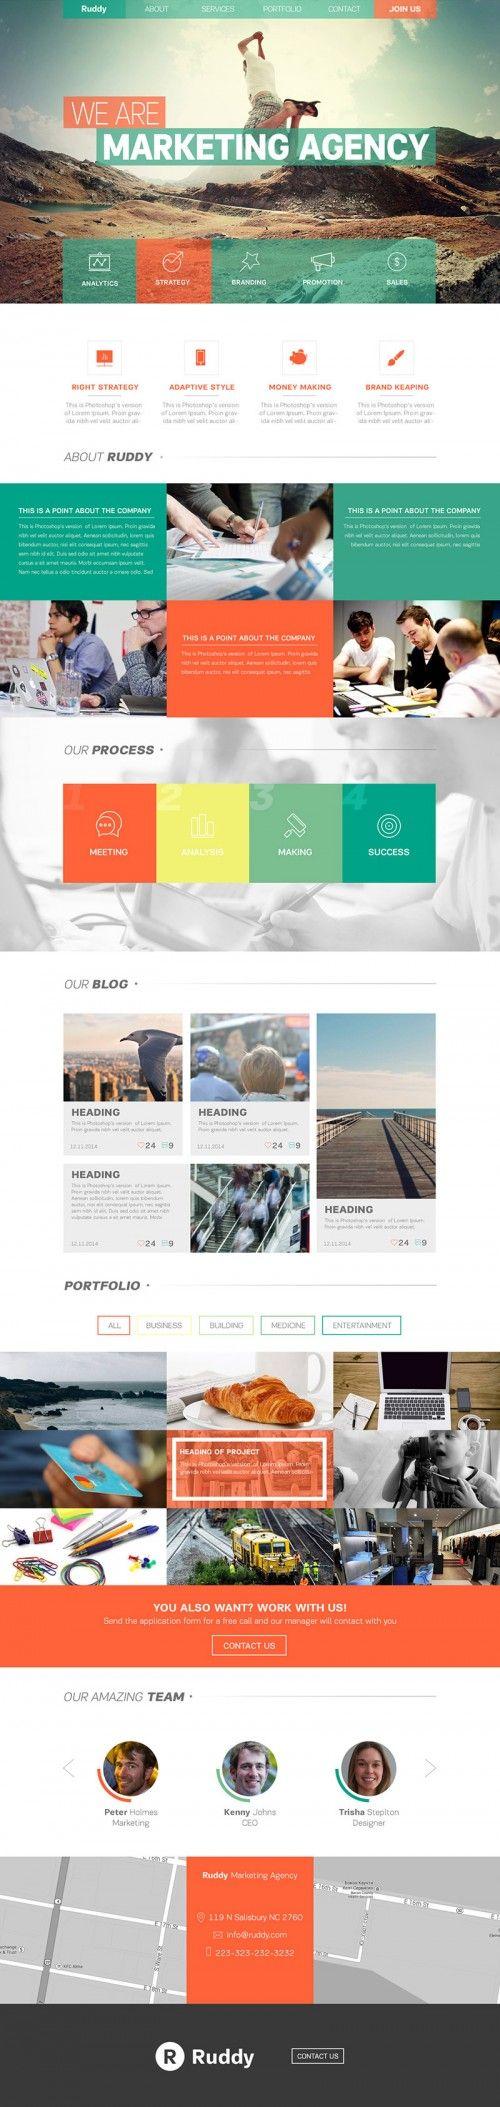 Clean One Page Website Theme PSD | 9 - Web / UI / UX | Pinterest ...